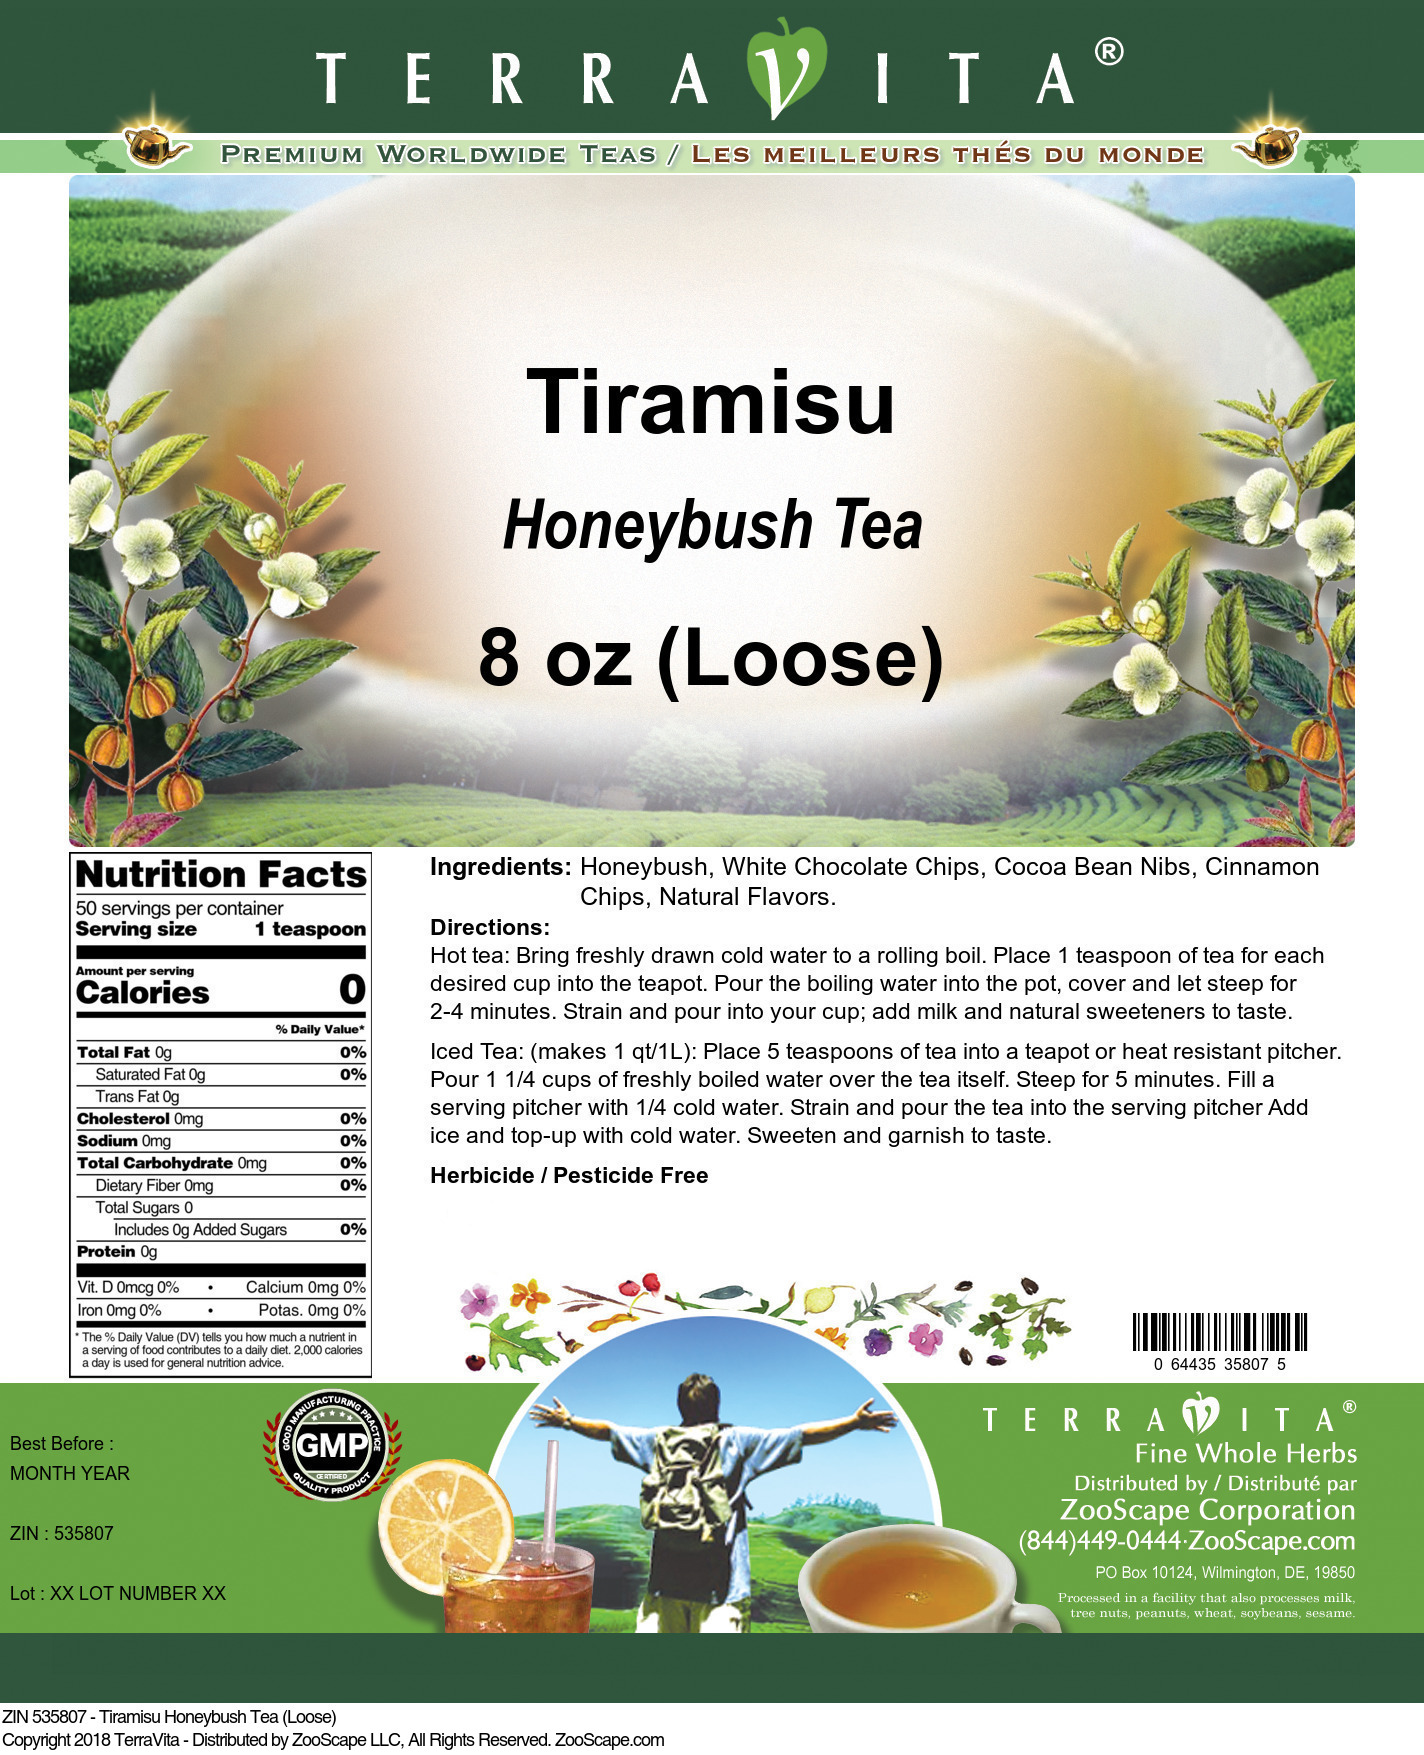 Tiramisu Honeybush Tea